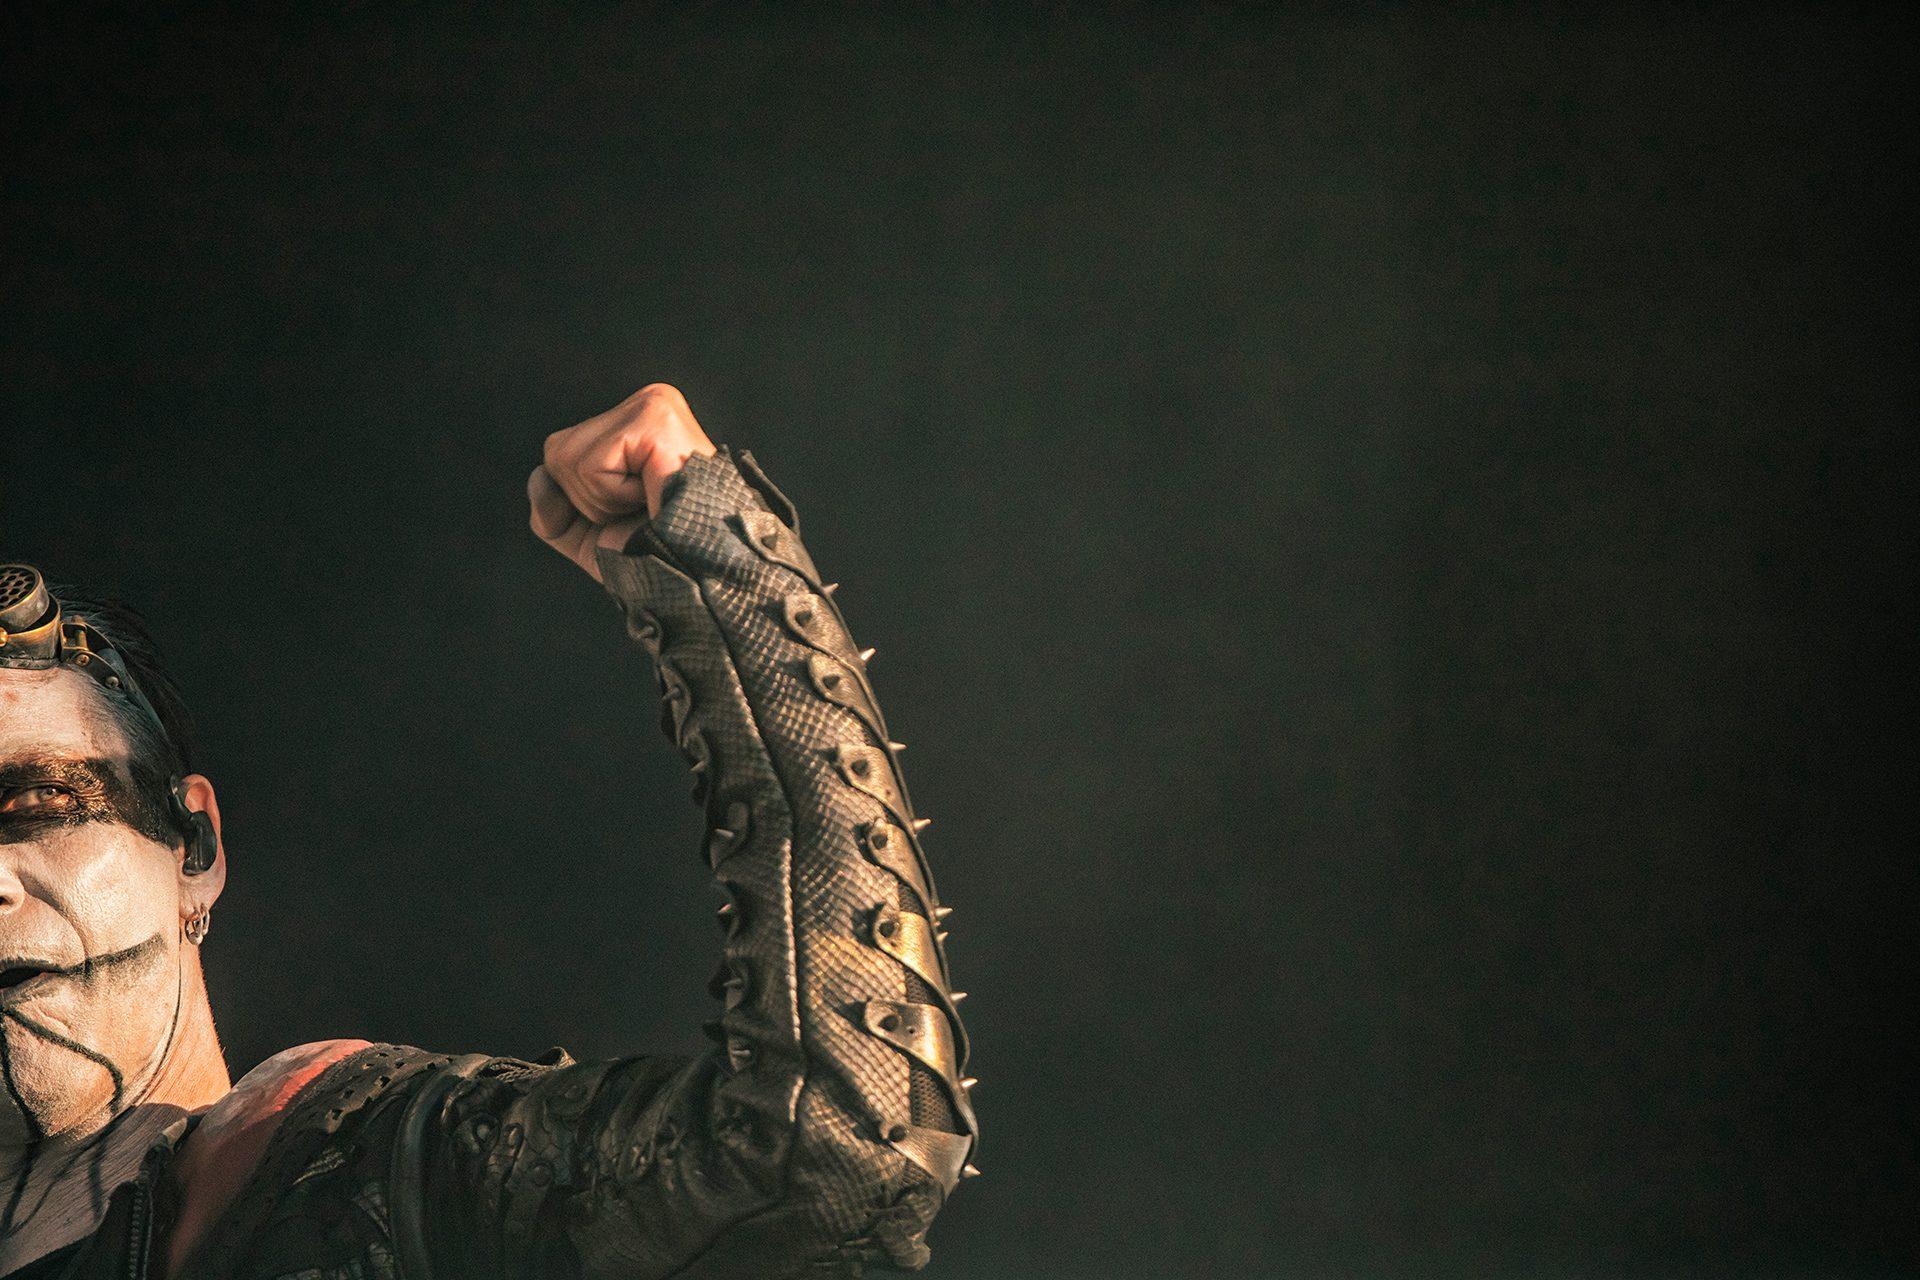 Gerlioz, Dimmu Borgir band, keyboardist, Tuska metal festival